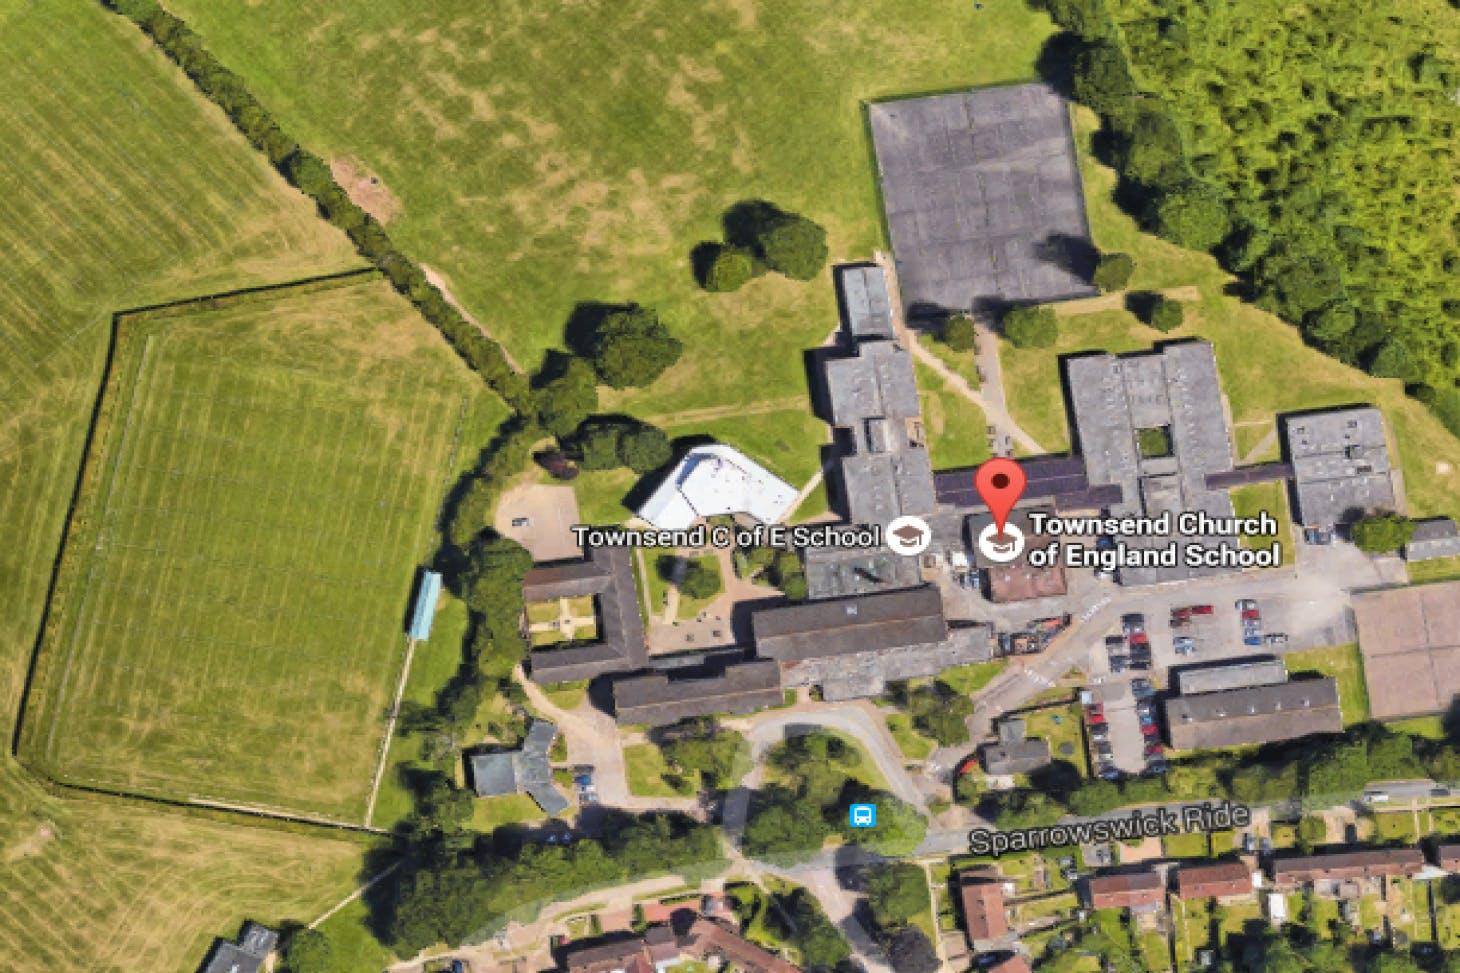 Townsend COE School Nets | Artificial cricket facilities